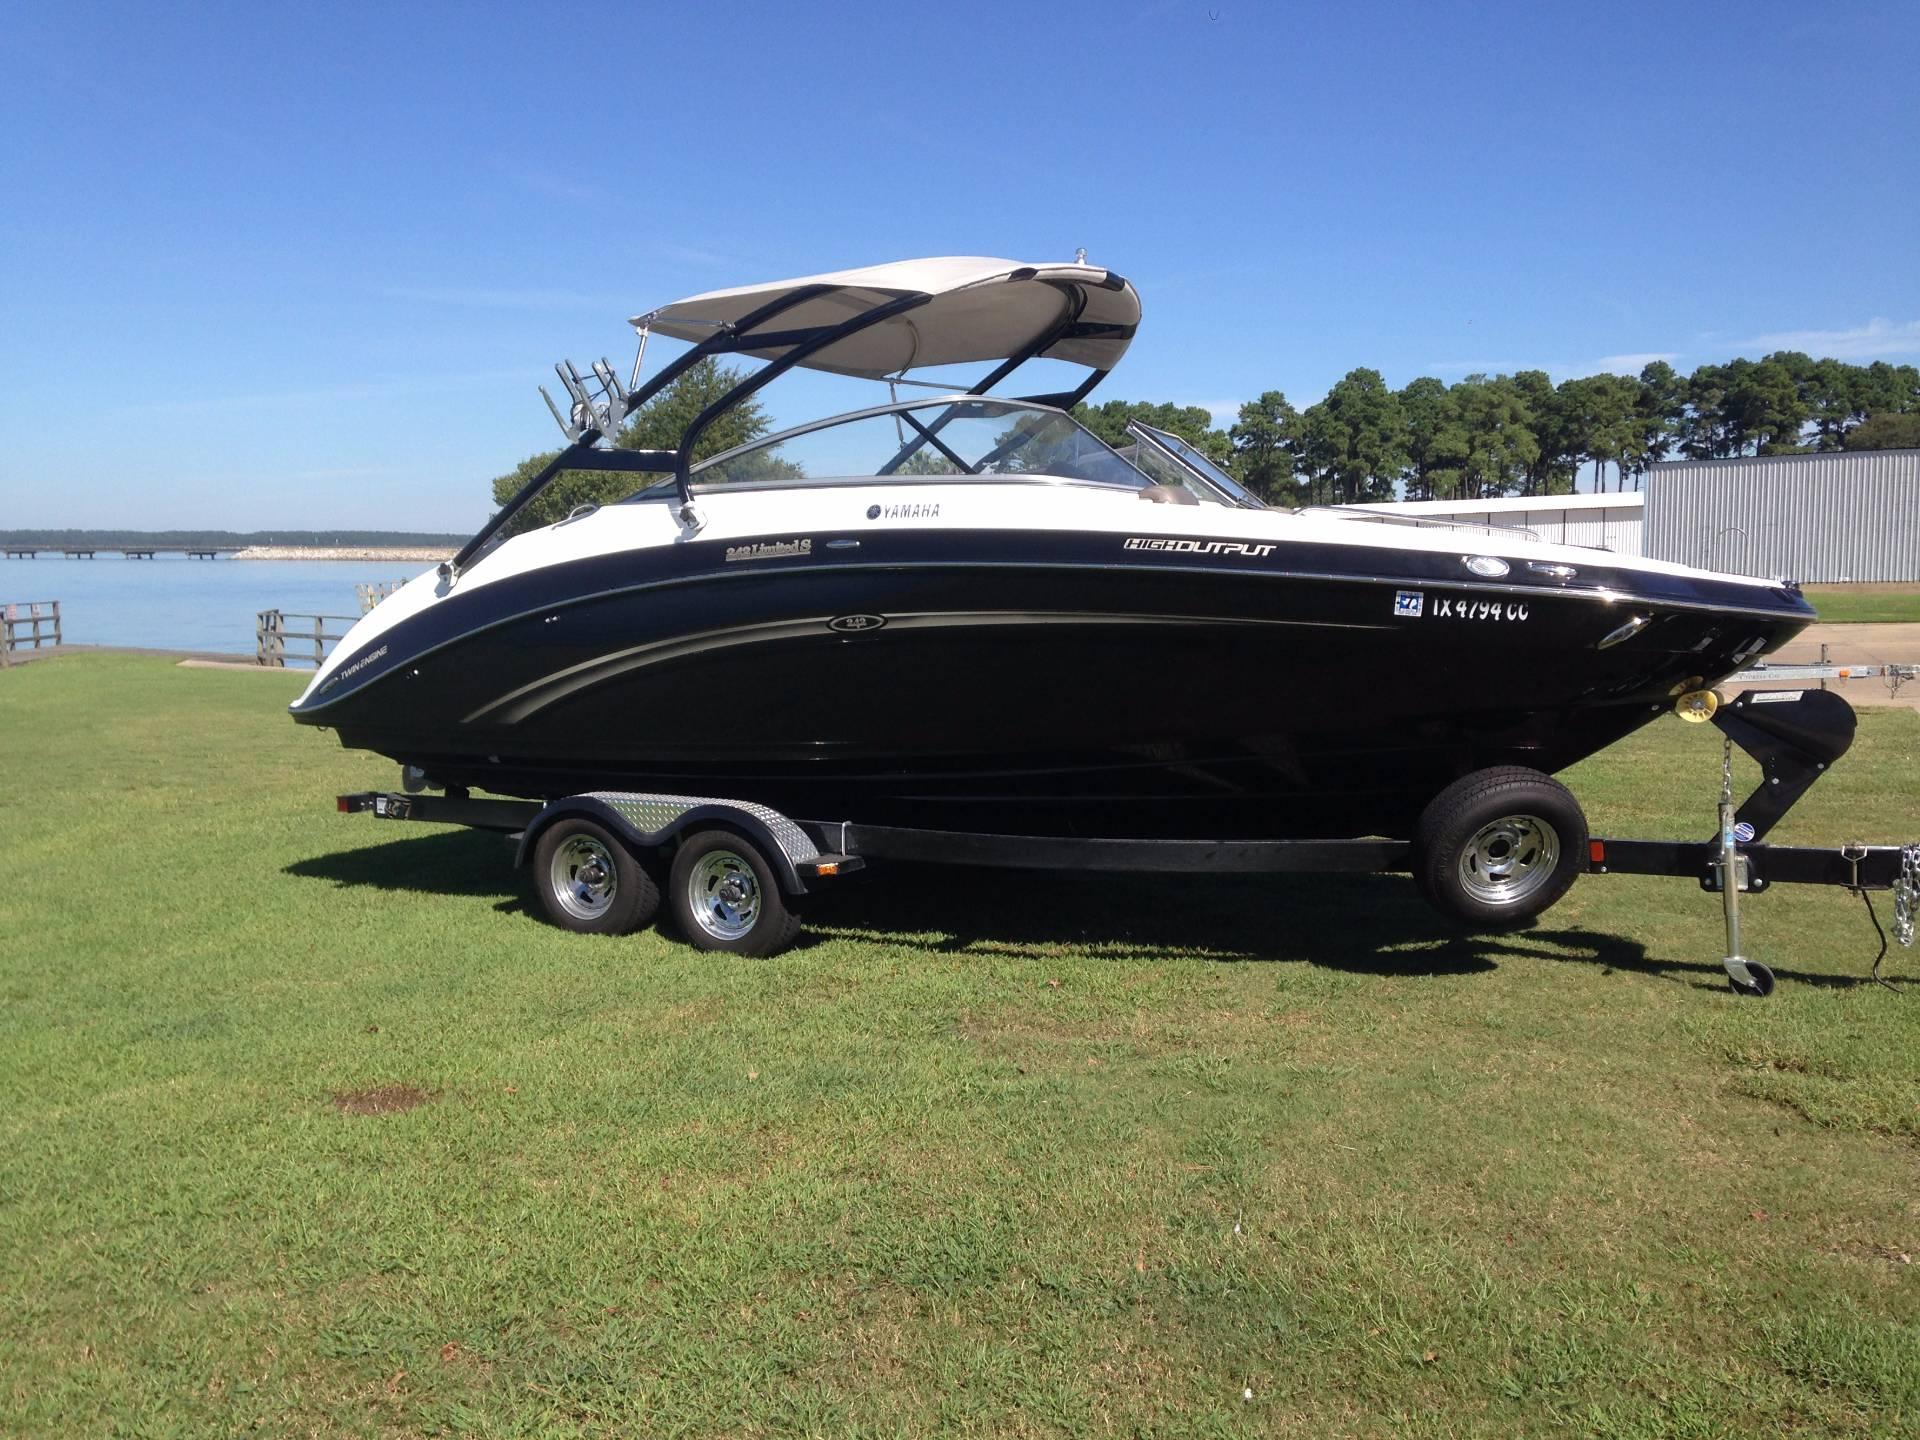 2013 yamaha 242 limited 24 foot 2013 yamaha motor boat for Yamaha boat dealers in texas